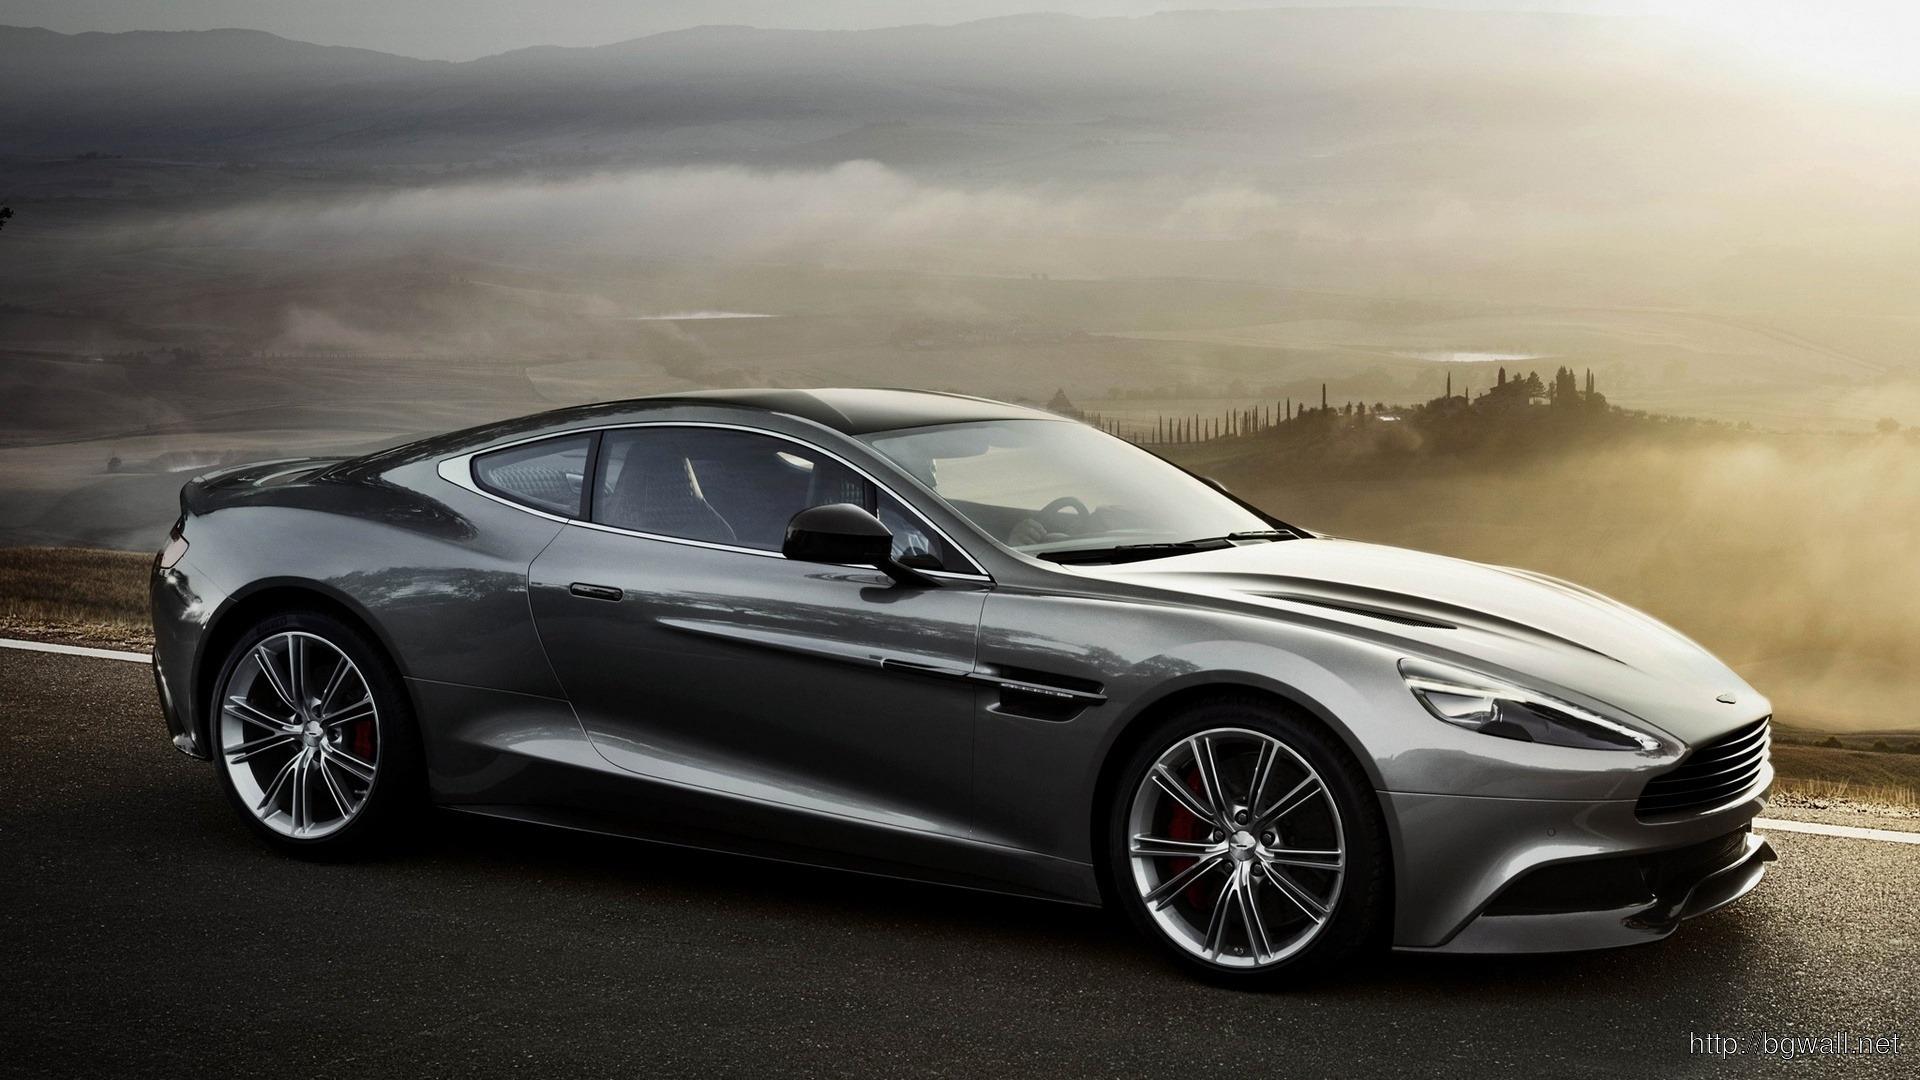 Aston-Martin-Car-Sport-HD-Wallpaper